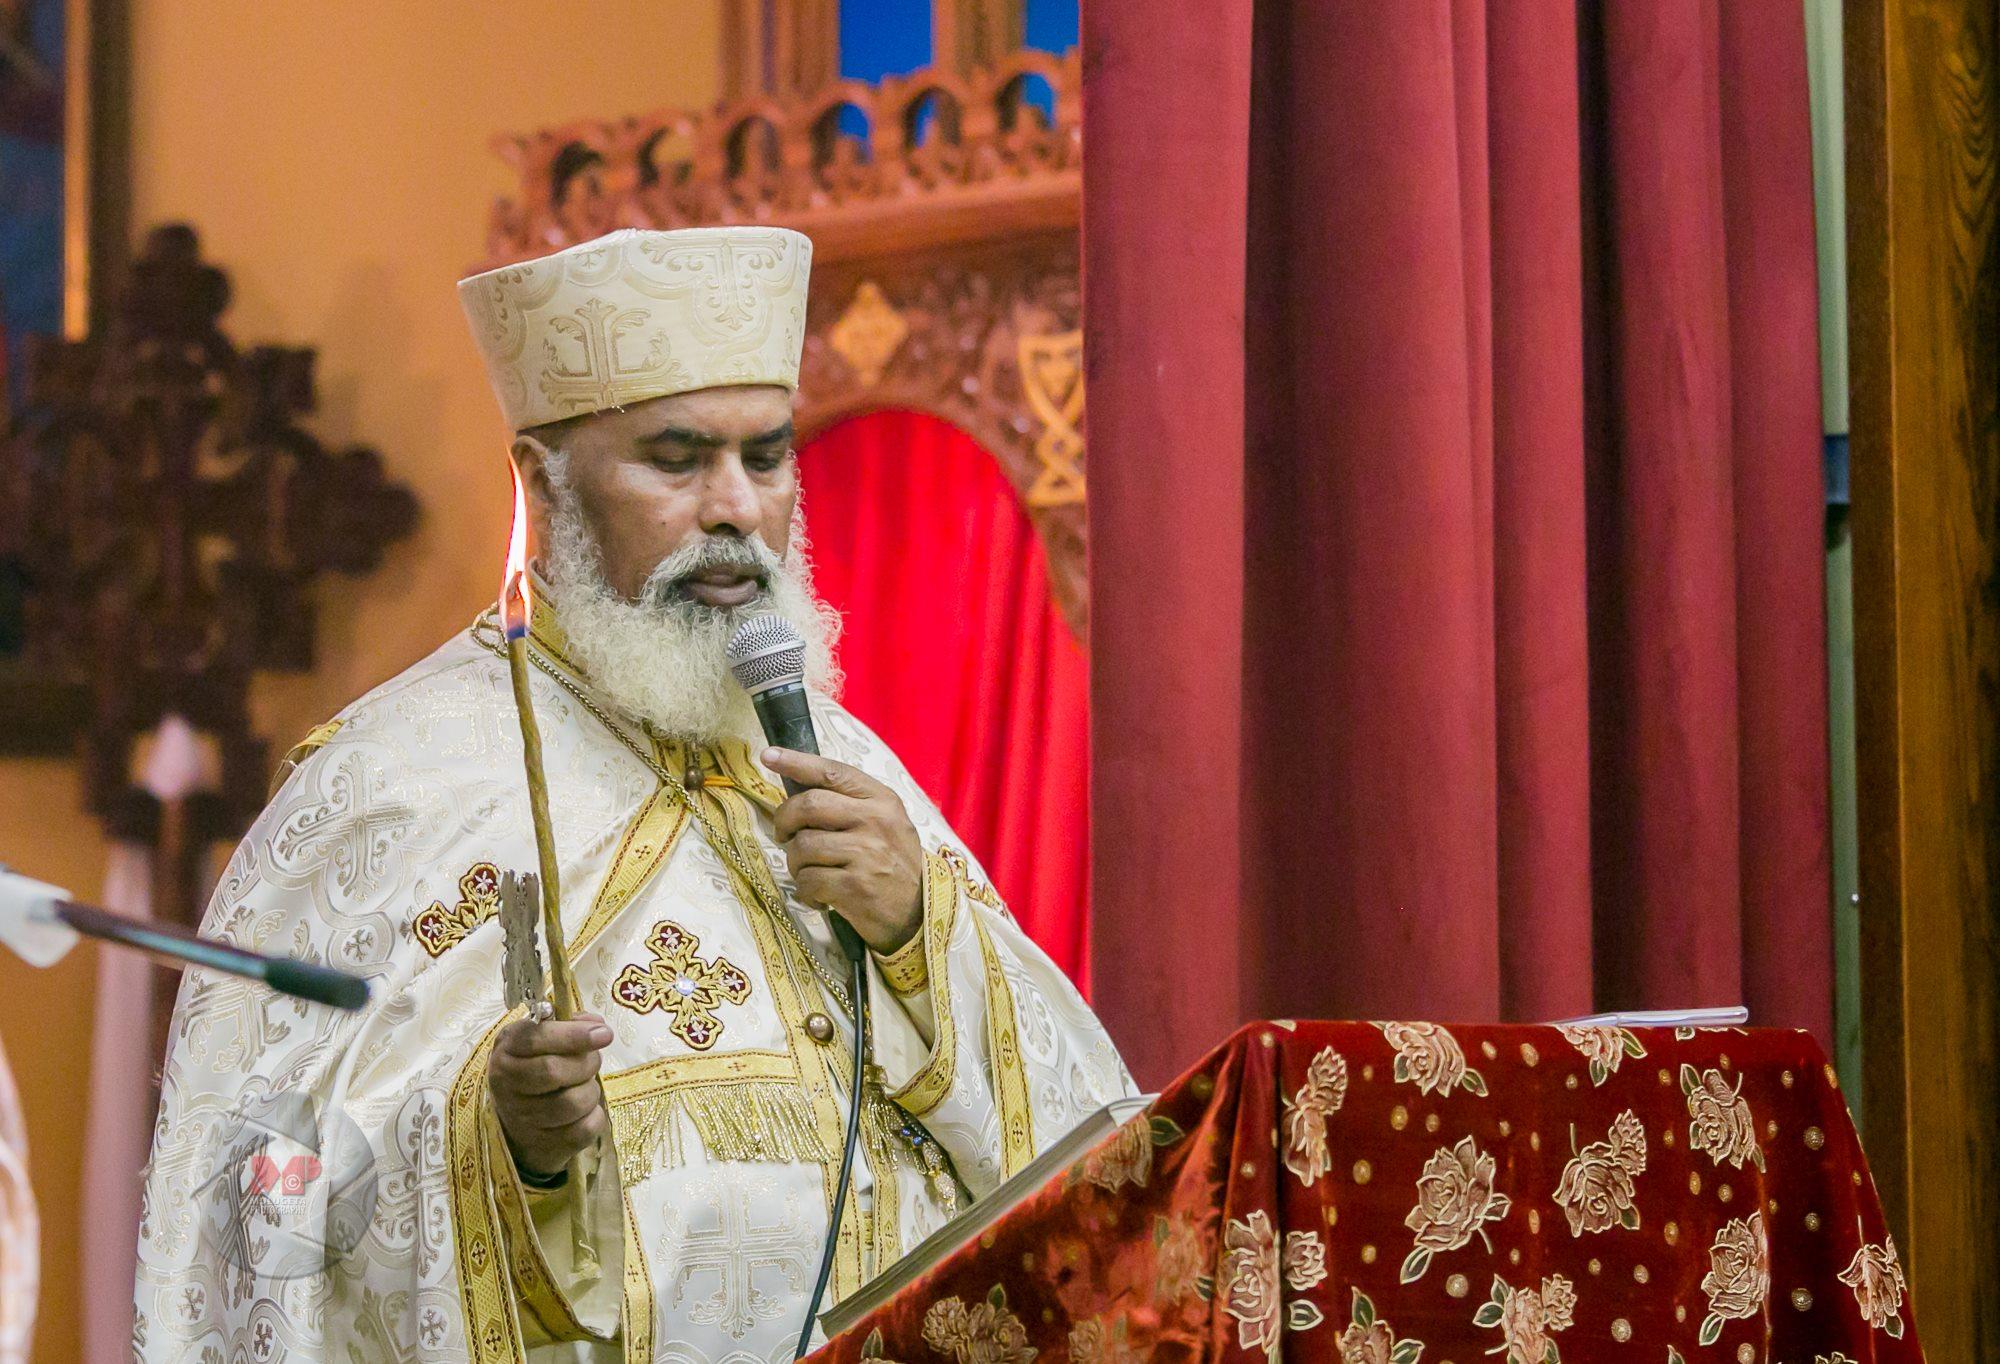 Like Kahenat (Rev. Fr.) Messale Engeda